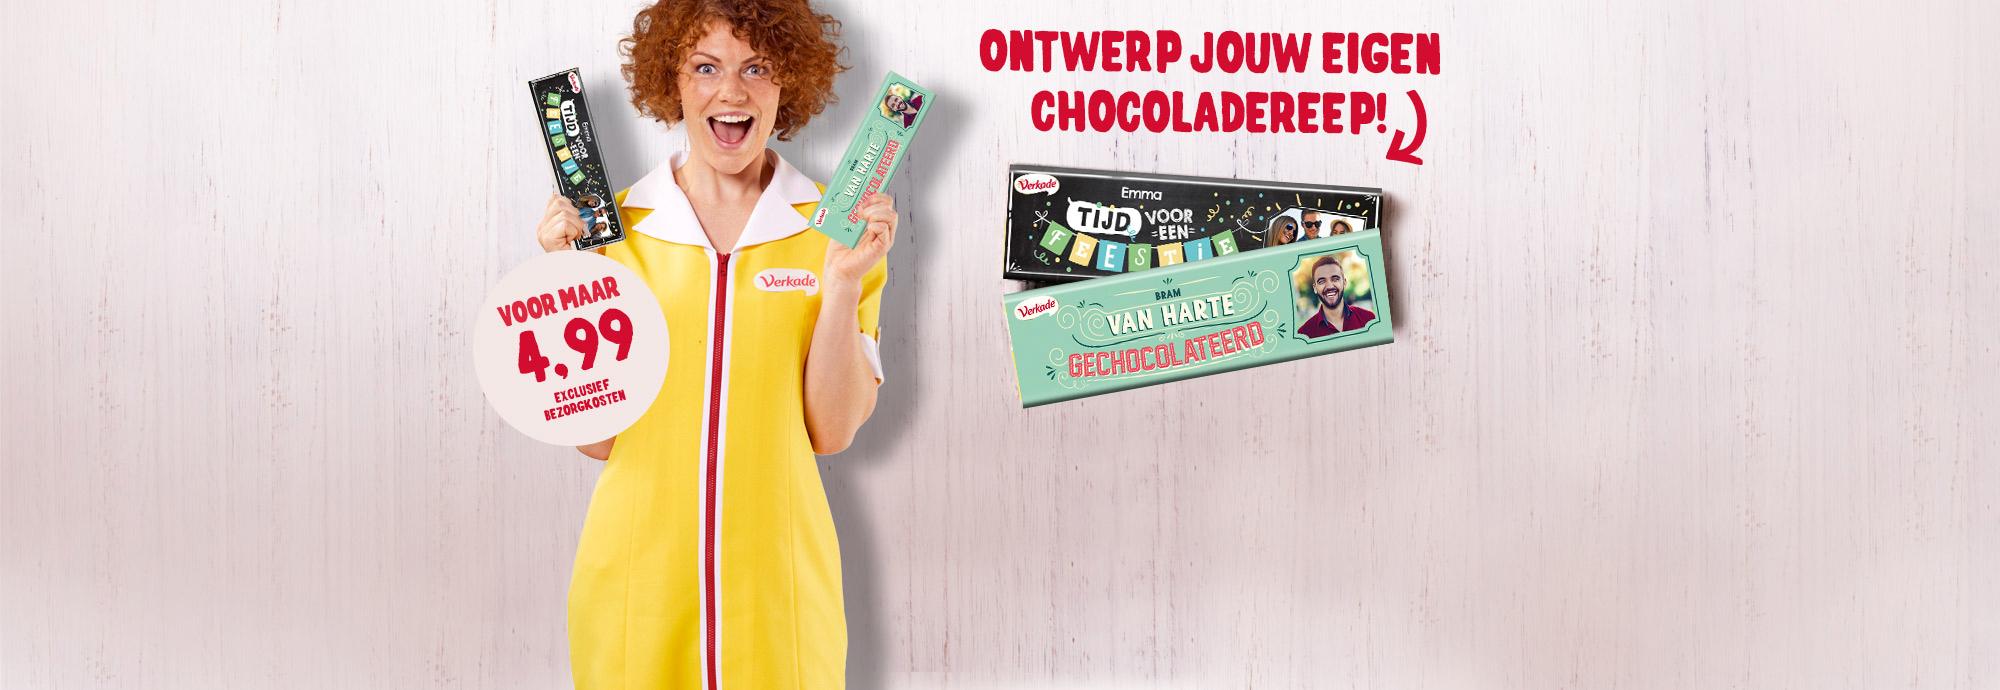 Ontwerp jouw eigen chocoladereep!